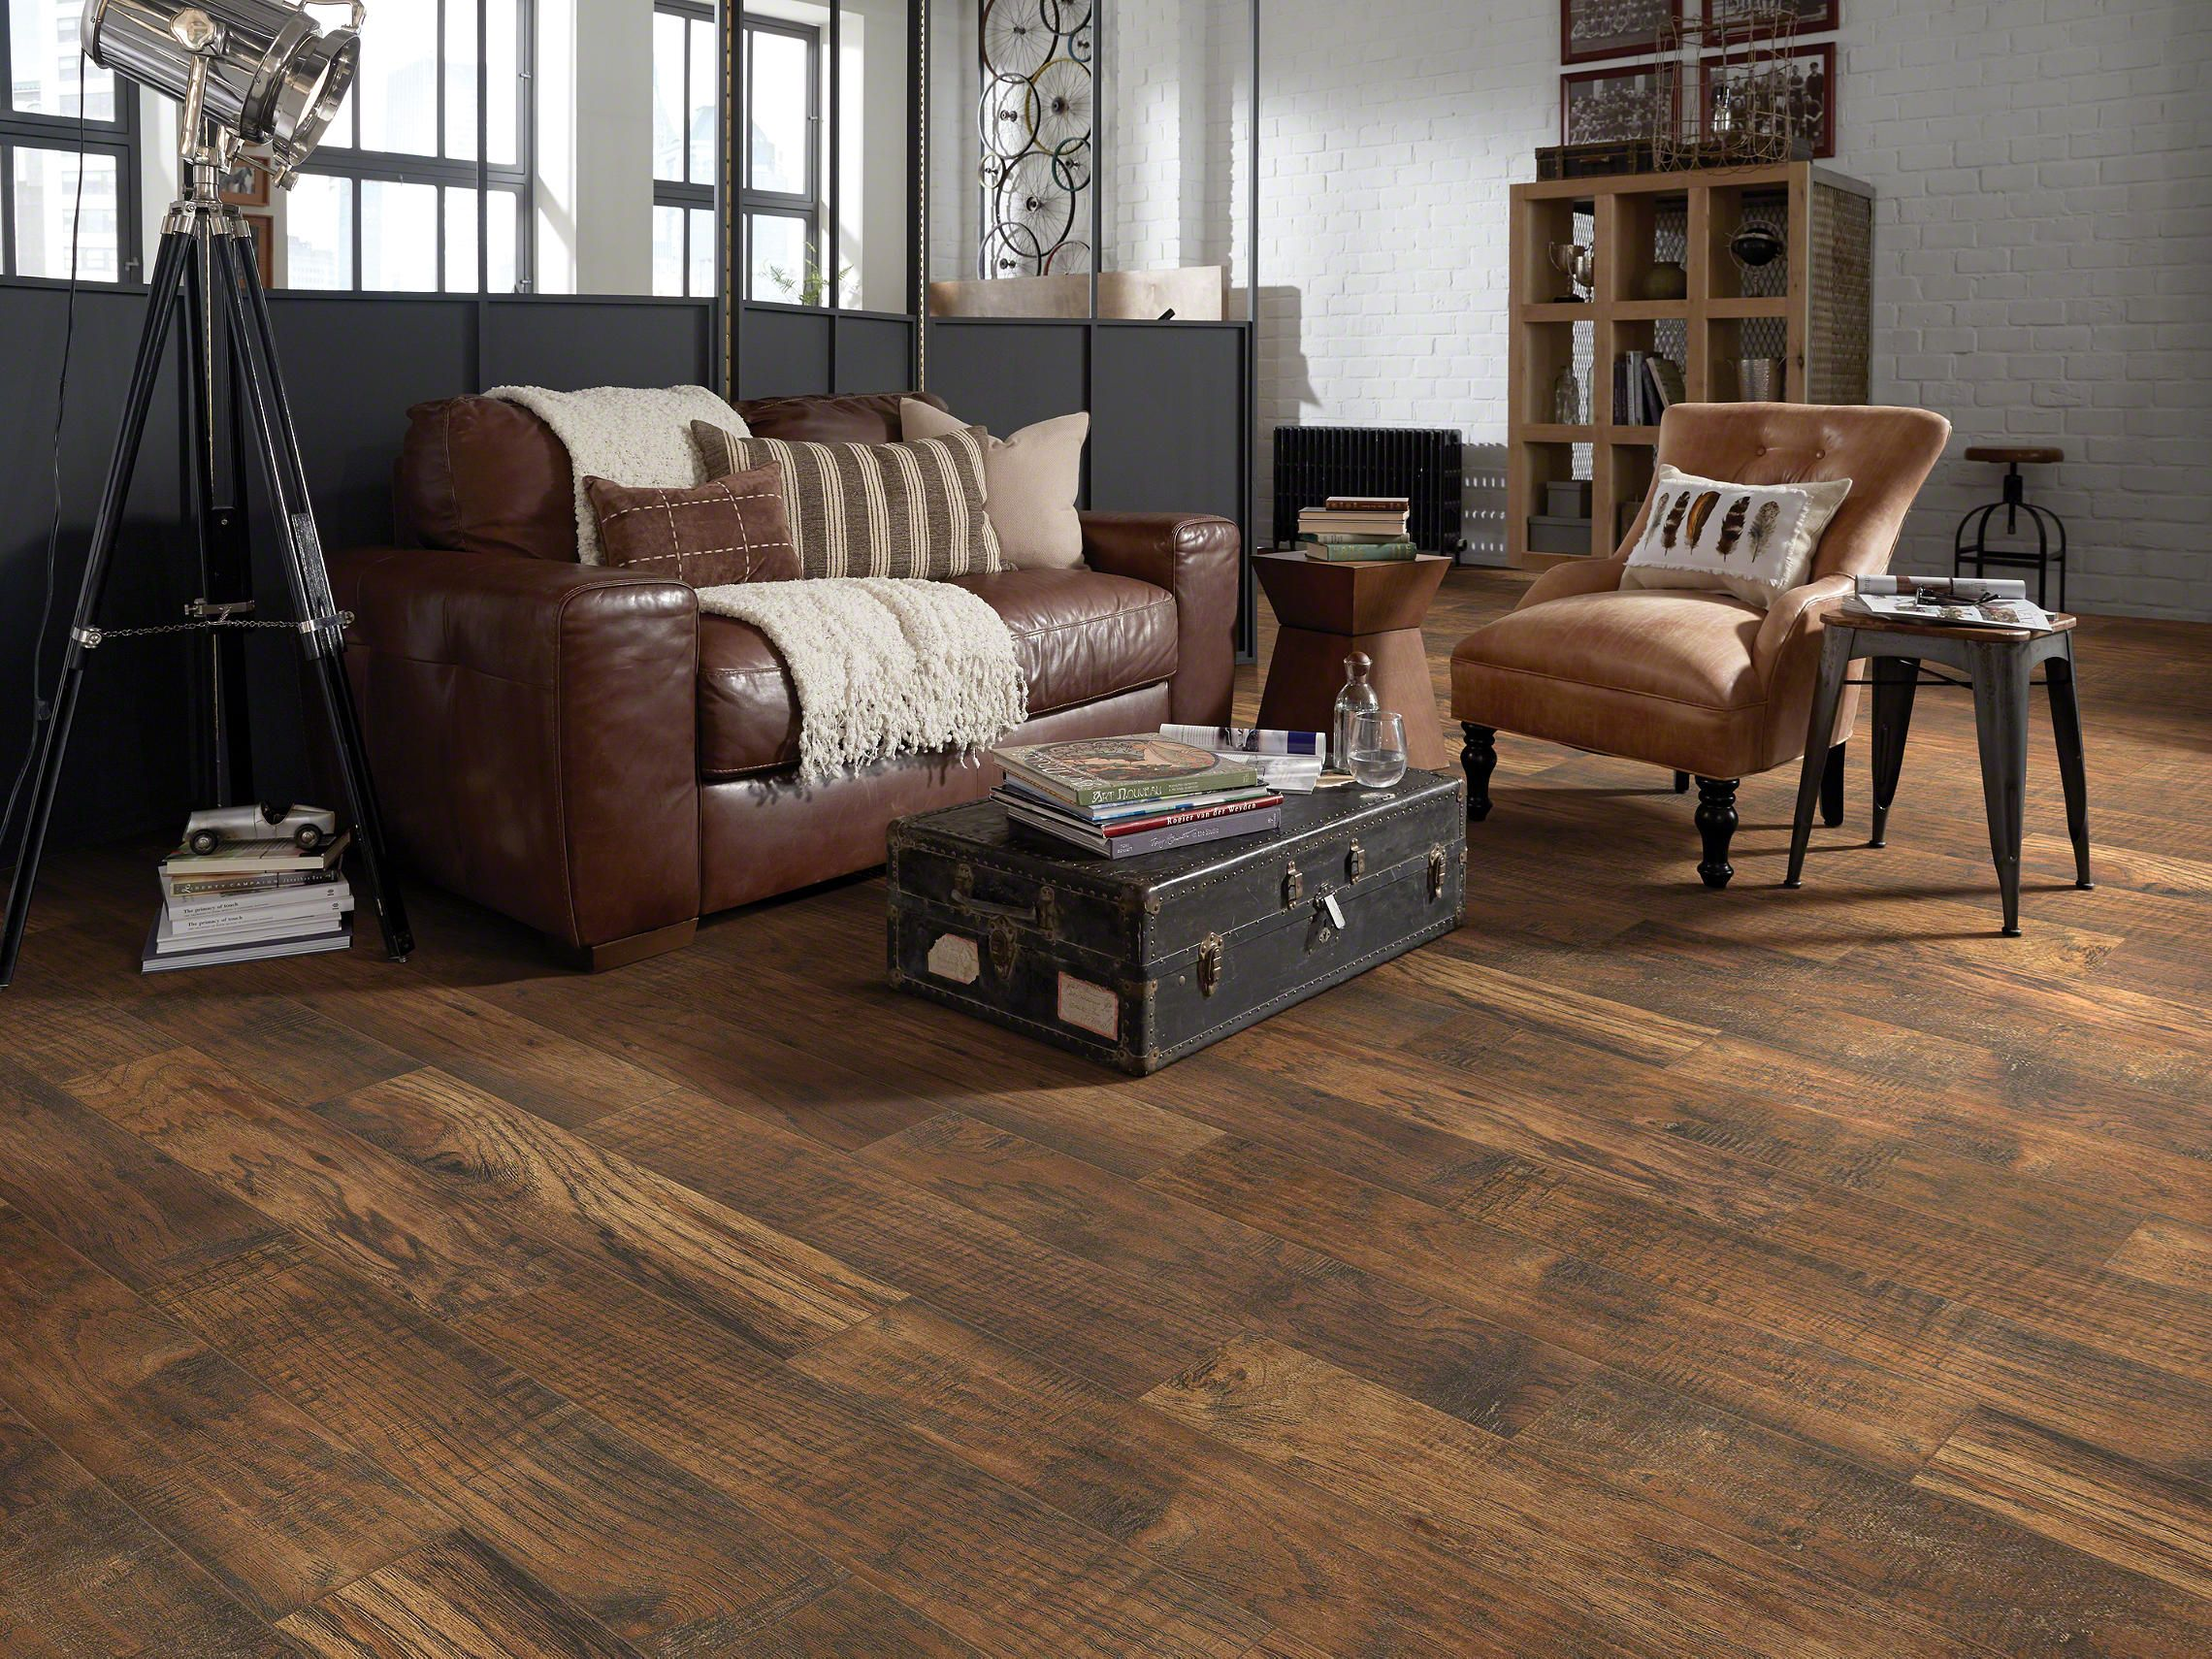 Hacienda 6x36 Cs61v Macadamia Tile And Stone Wall And Flooring Tiles Flooring Hardwood Floors Home Decor